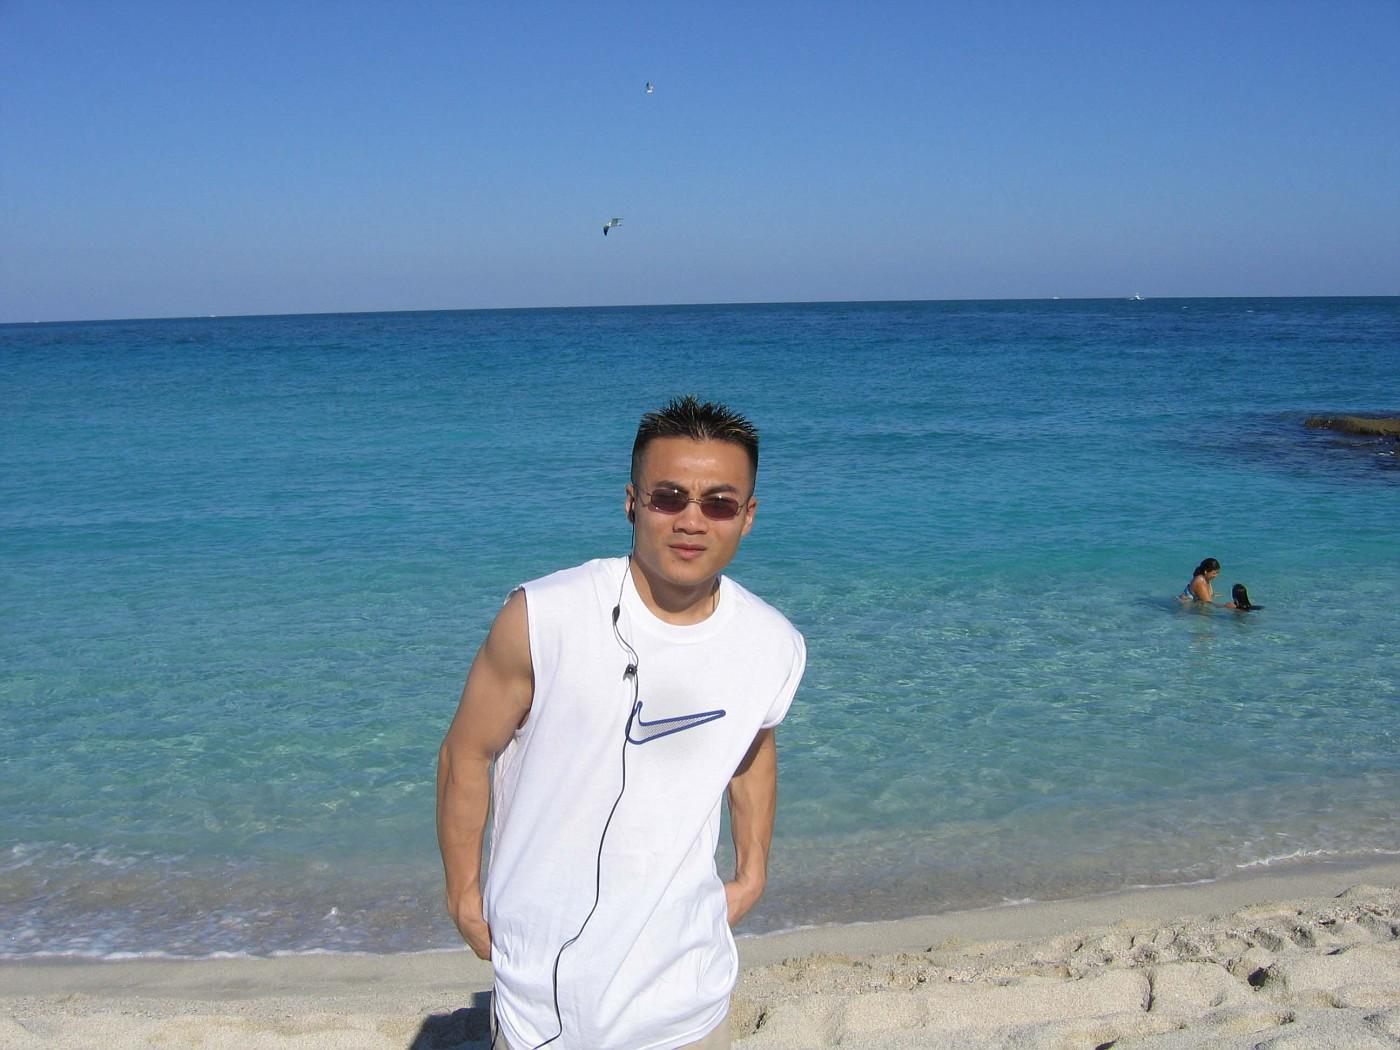 2/2005......MIAMI BEACH, FL